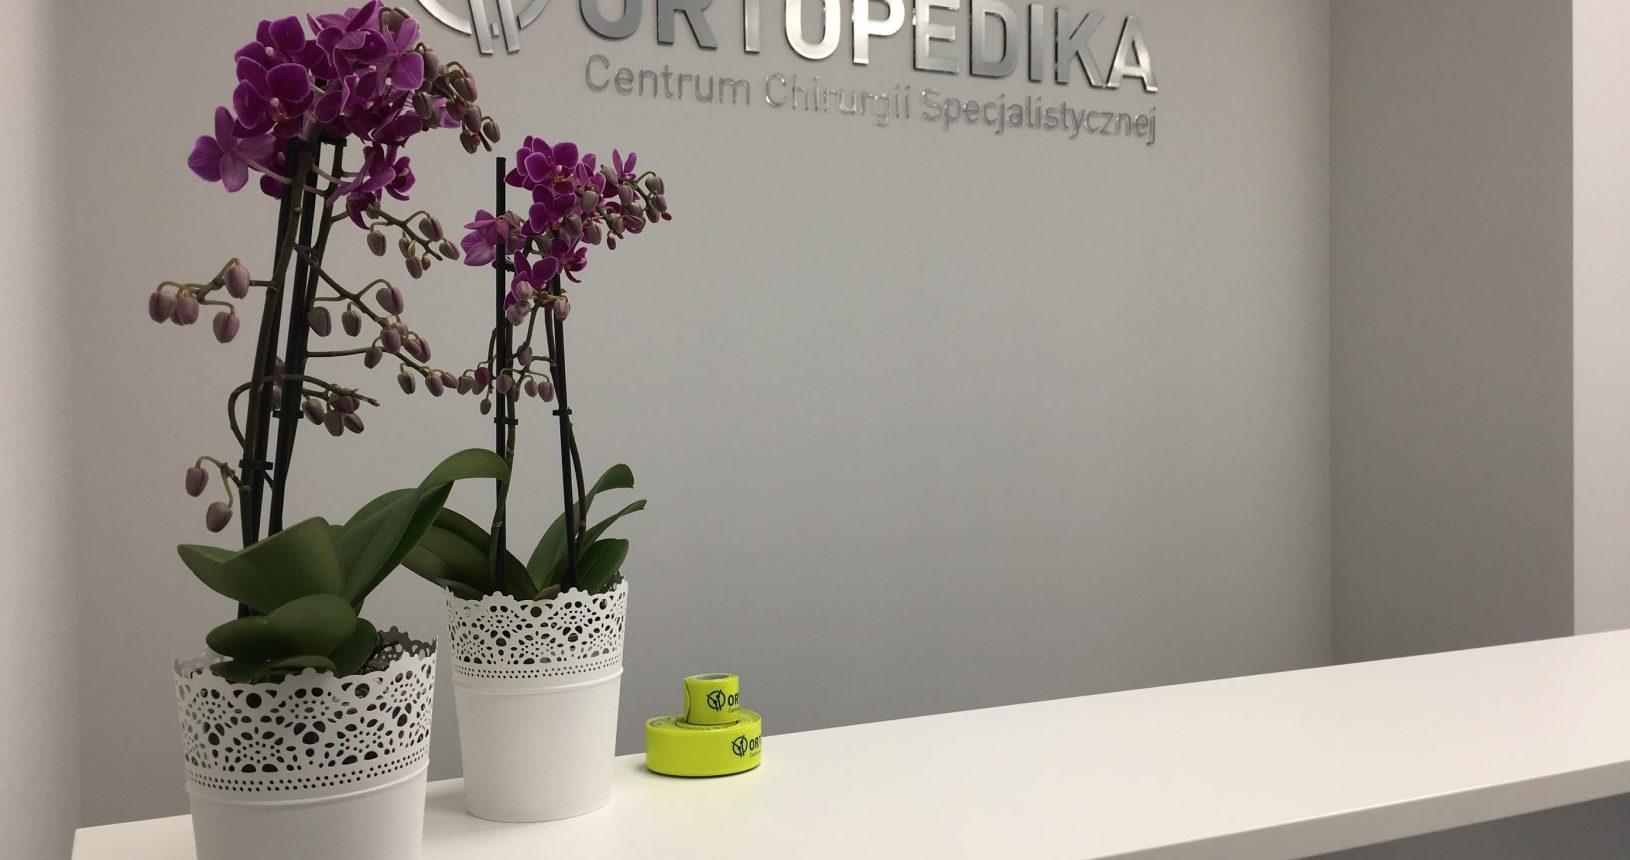 Ortopedika unnamed-3-1630x860